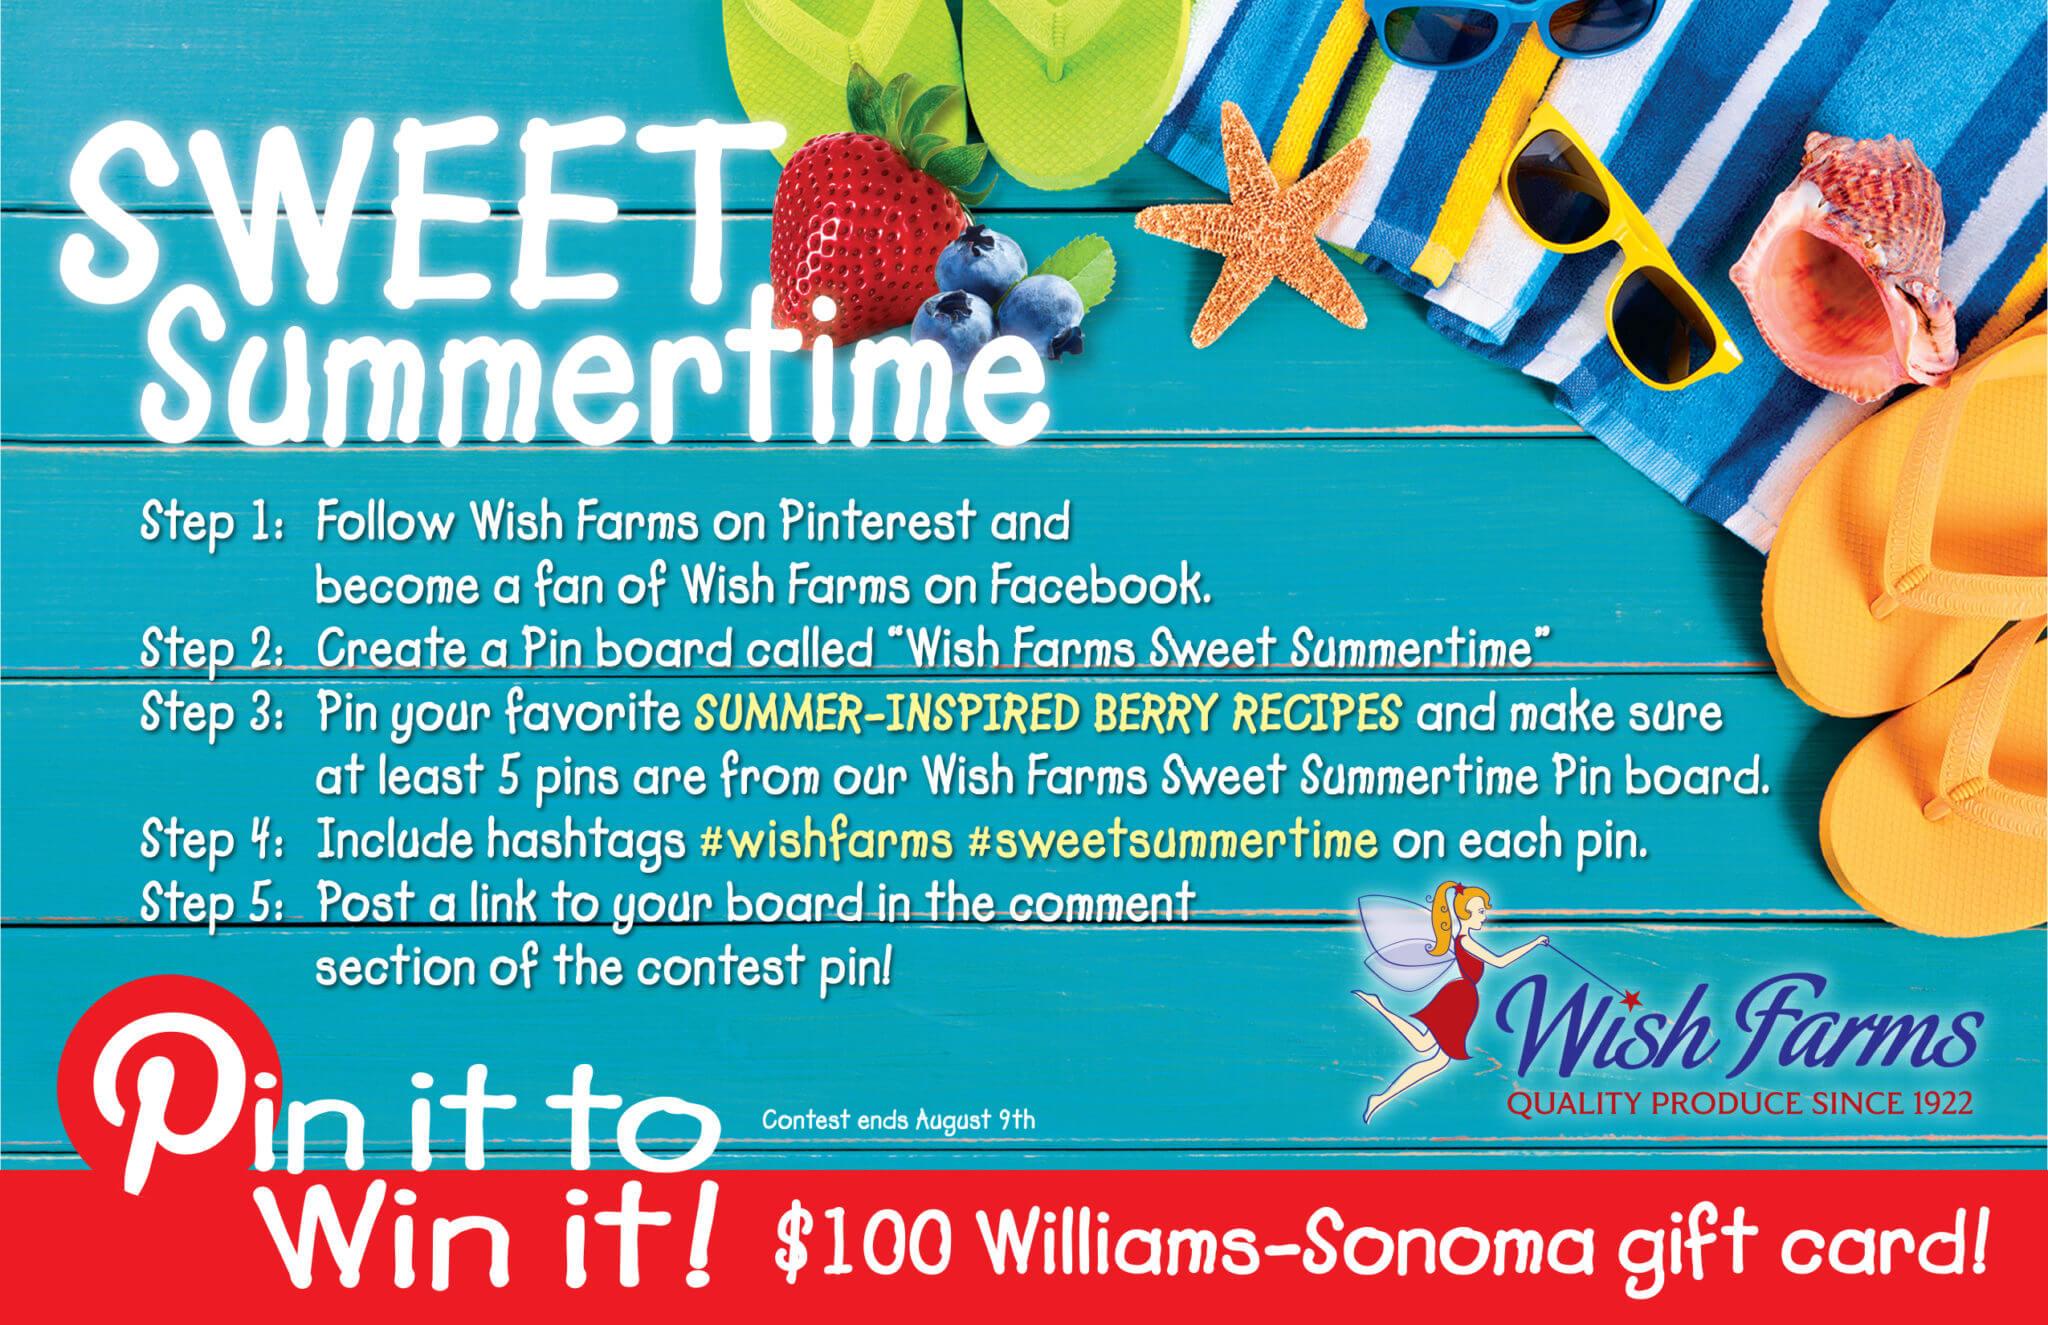 #SweetSummertime #wishfarms #pin2win